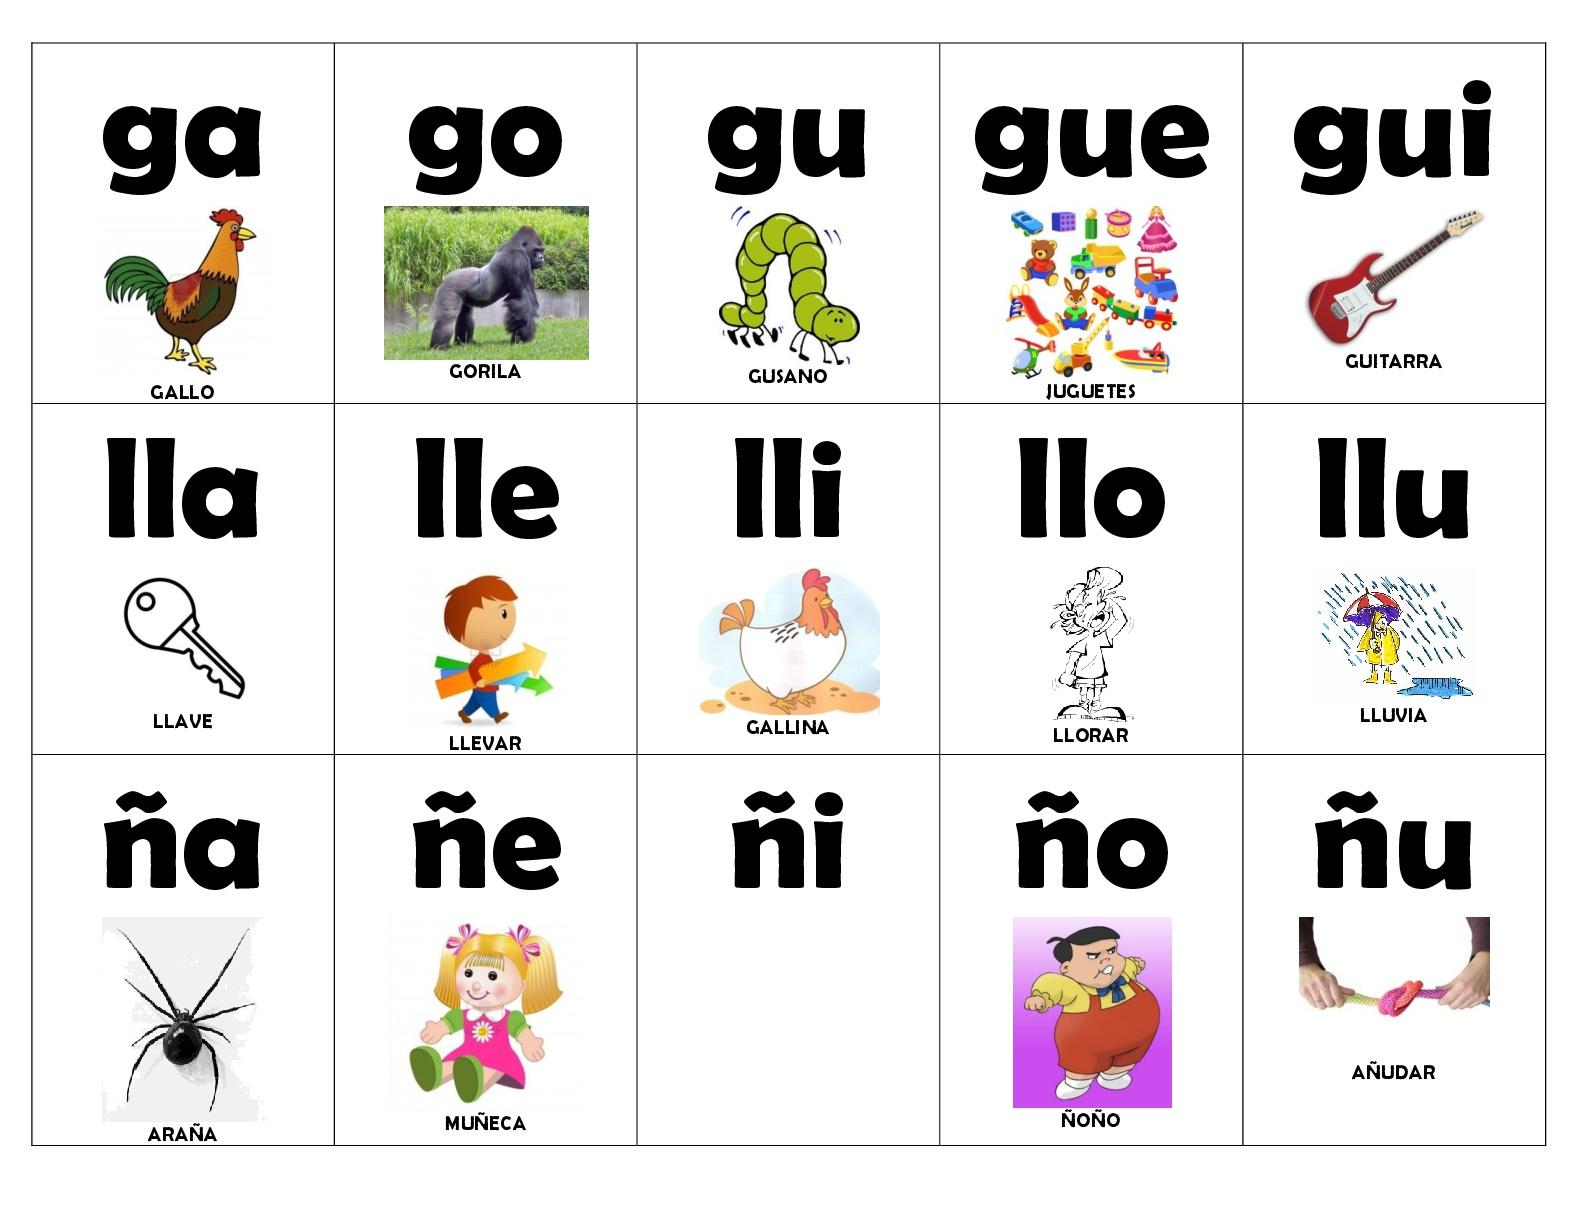 Tarjetas sílabas 2 (2) - Imagenes Educativas